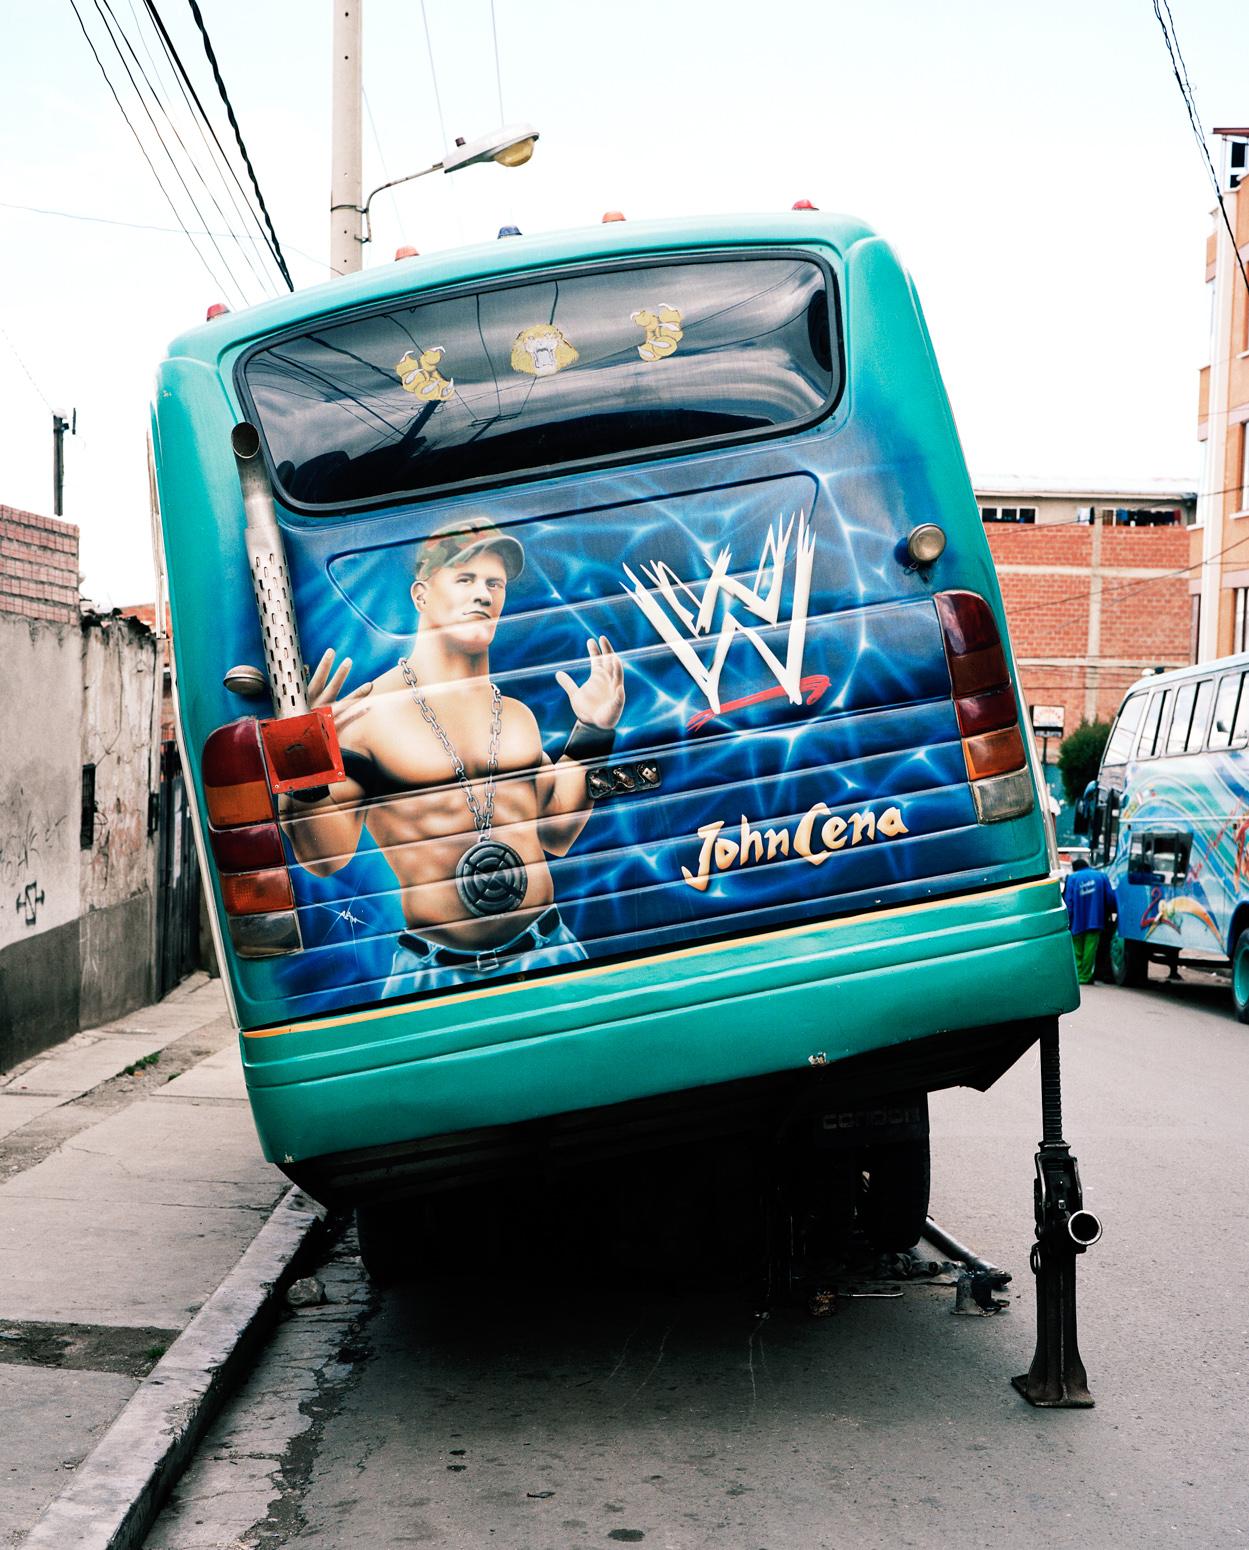 Daniel_Hofer_Bolivian_Busses_199_06_1550PX_WEB.jpg